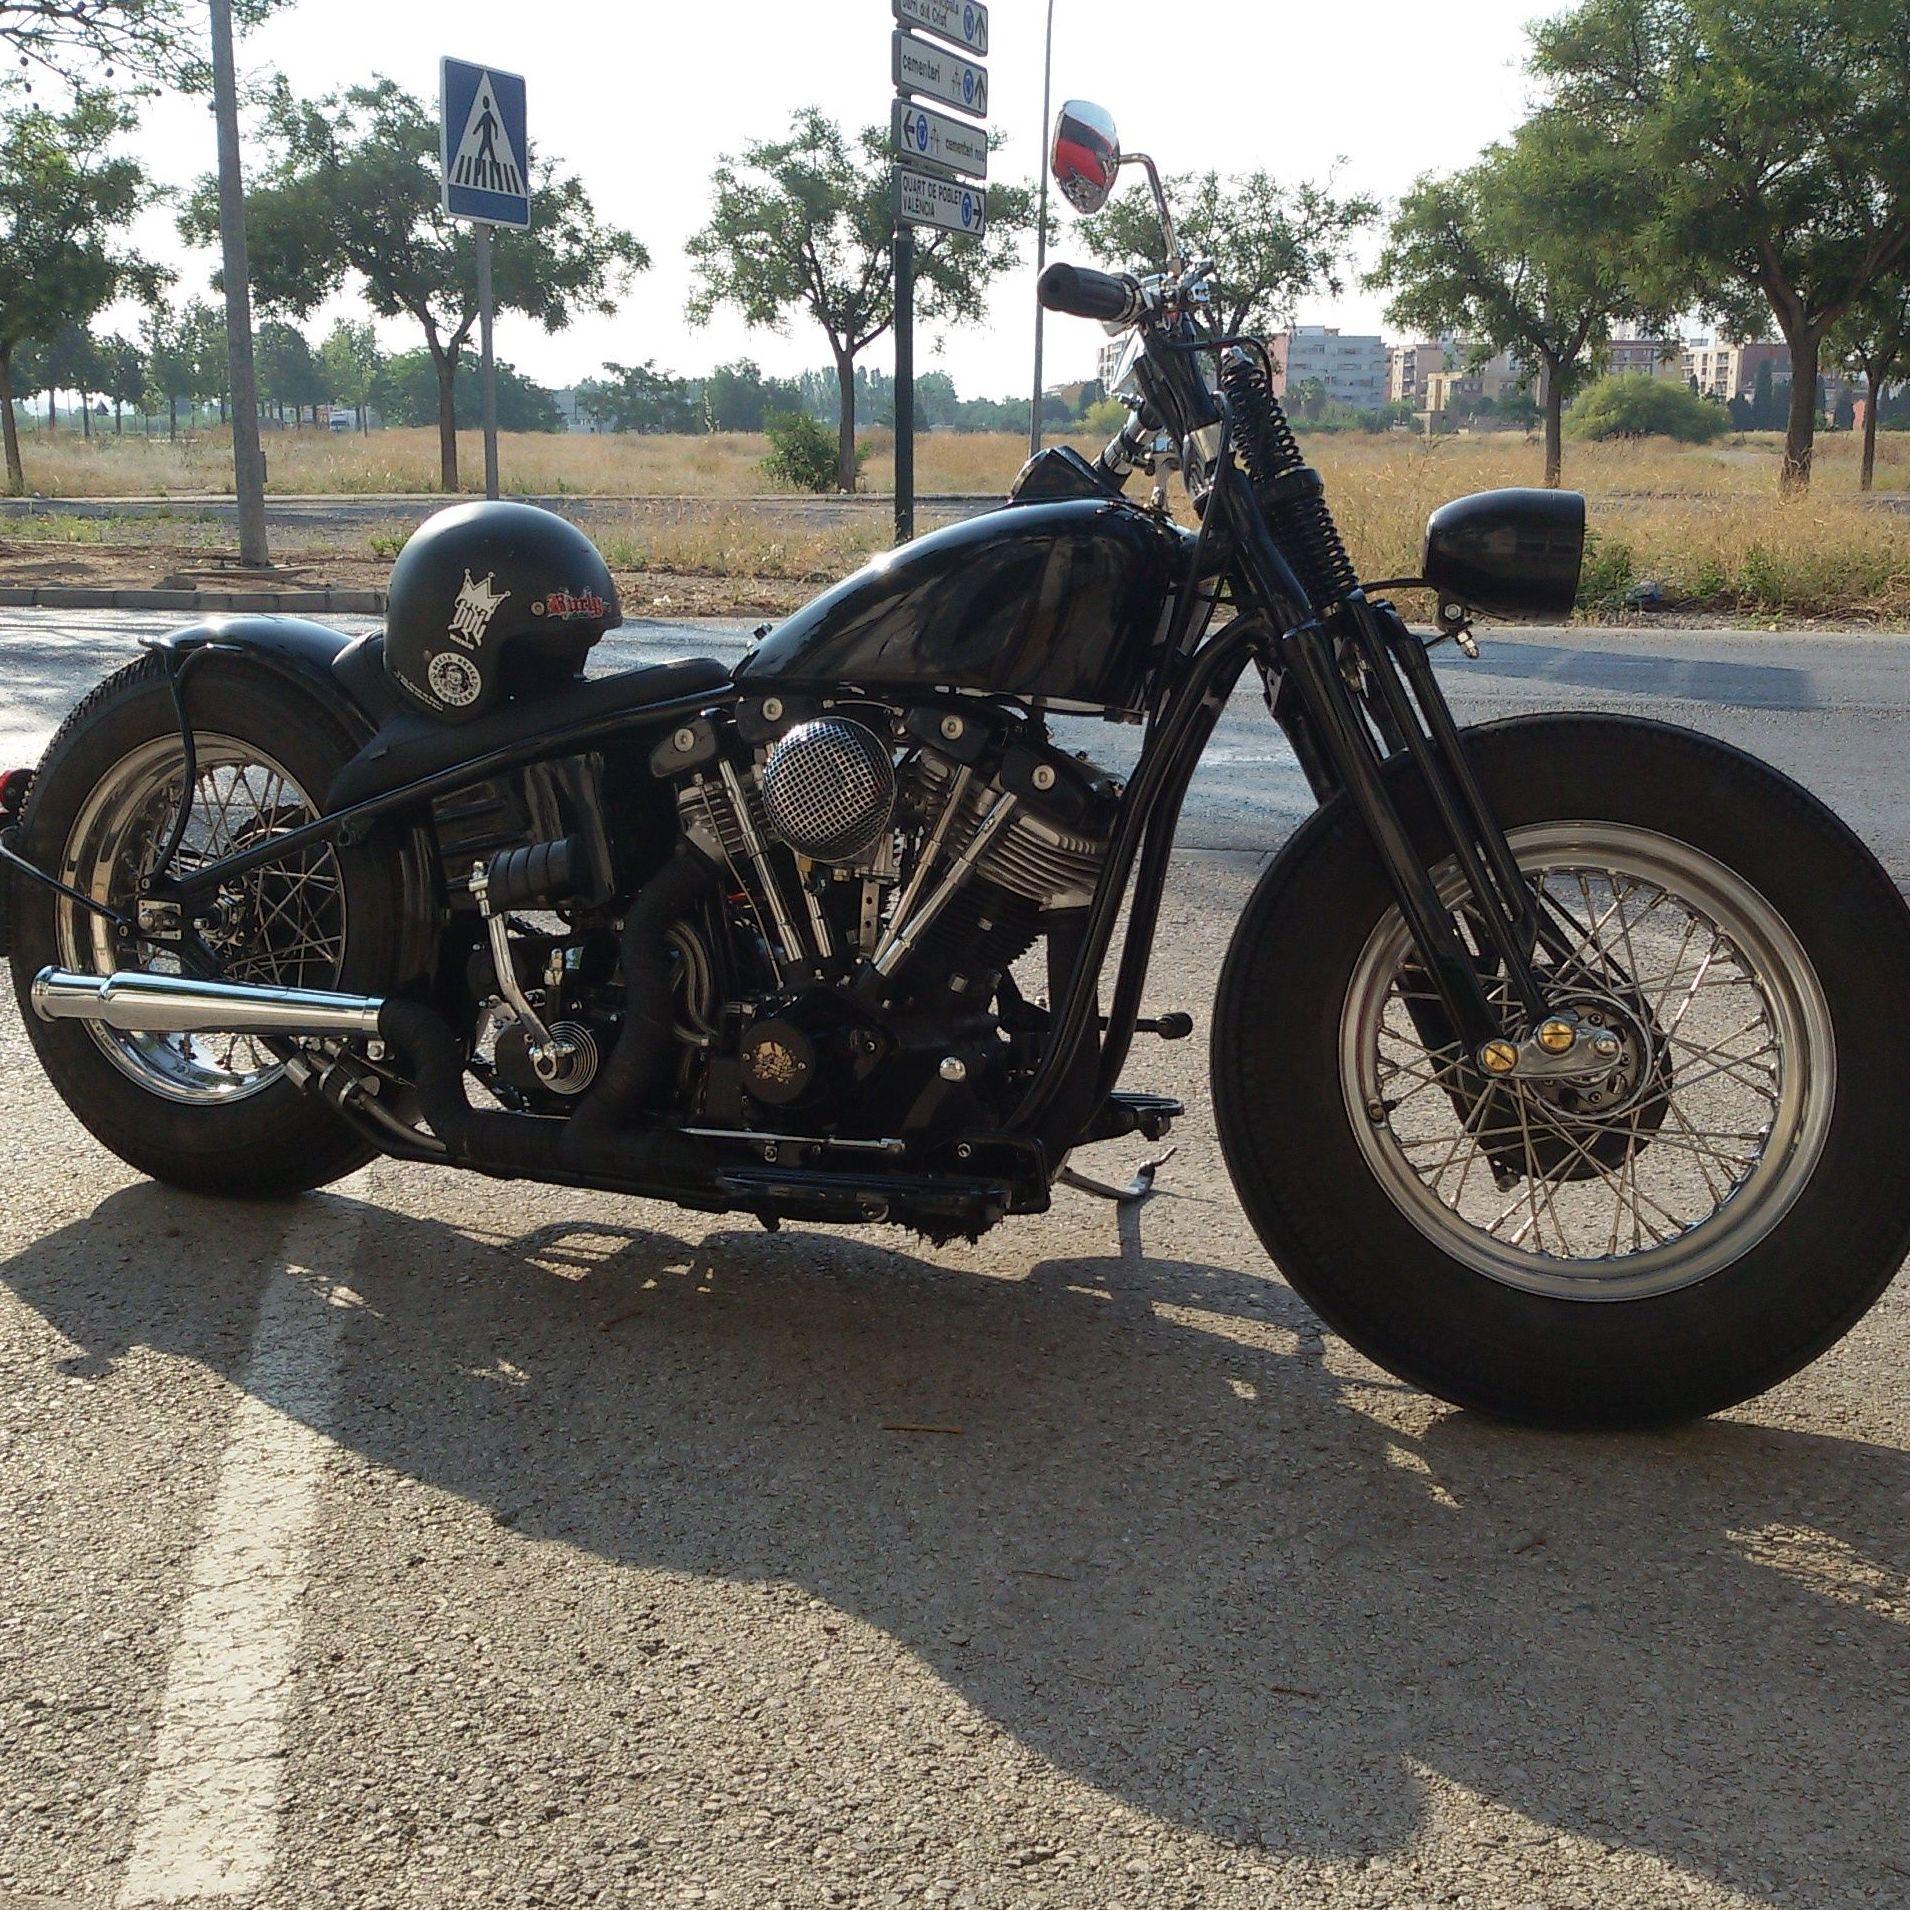 transformacion harley davidson,motos vintage, restsuracion motos,harley davidson shovelhead,customizar shovelhead valencia